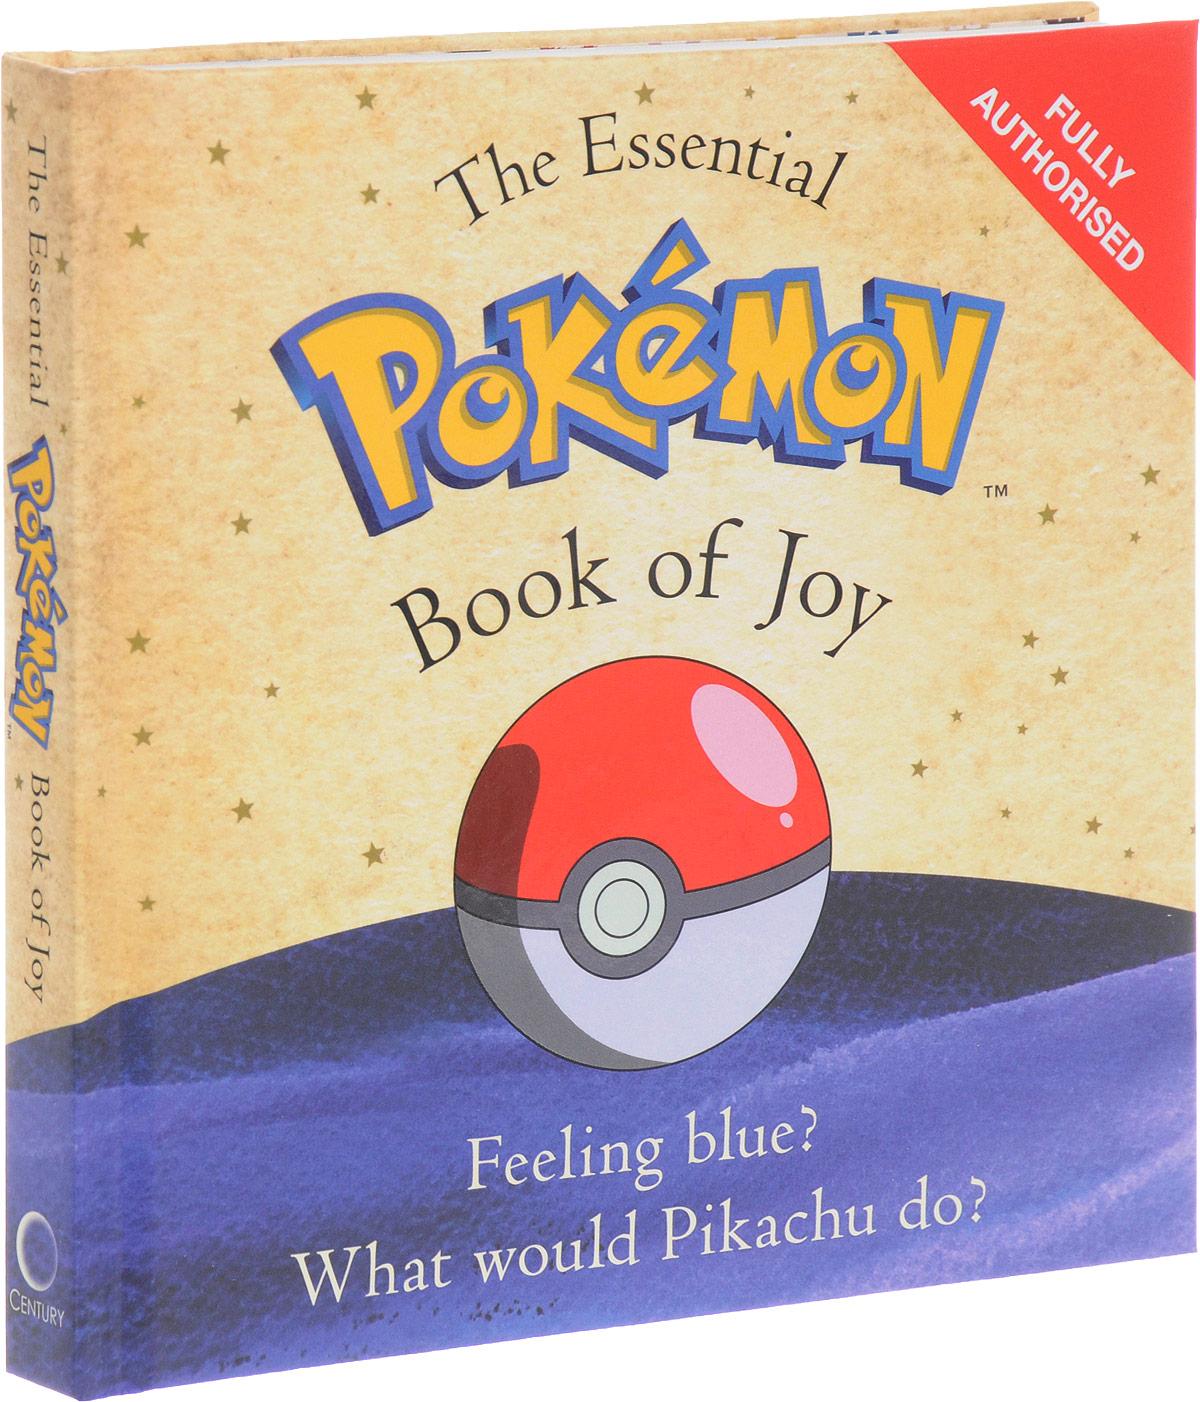 The Essential Pokemon Book of Joy journey to the centre of the earth teacher s book книга для учителя